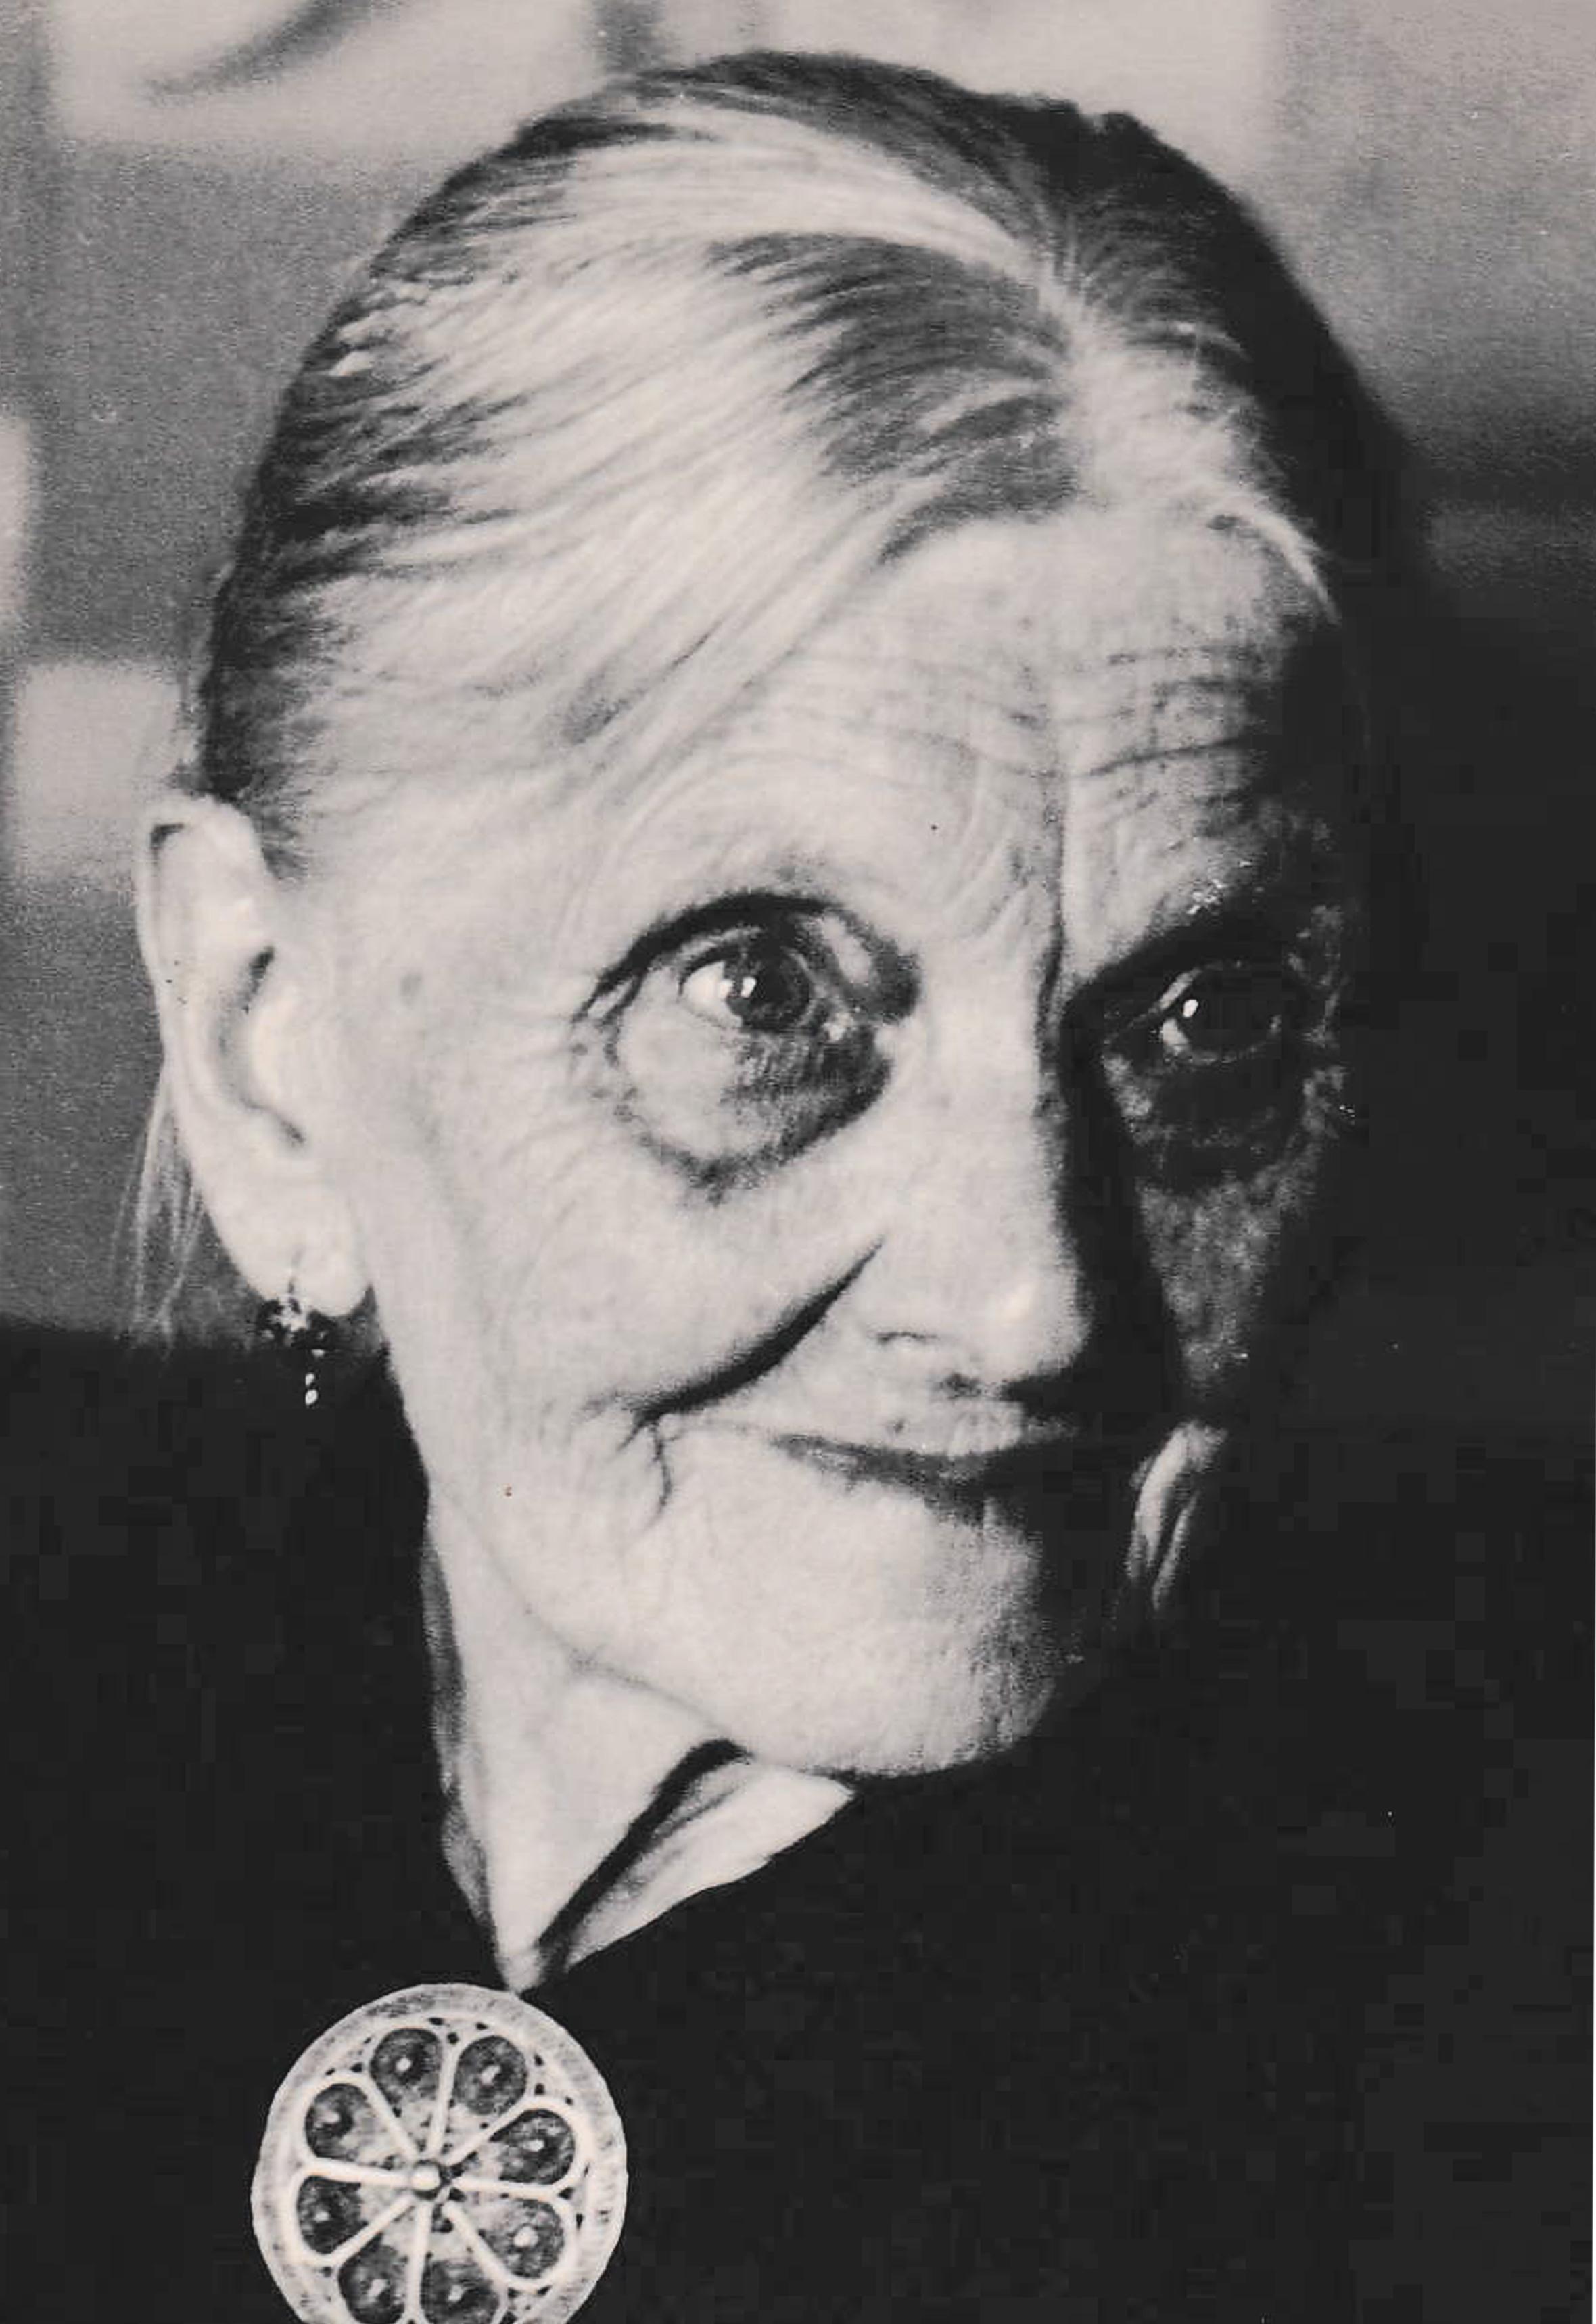 Augusta Köppen , Gertrud's mother and Elsa's grandmother, was known as Mütterchen (little mother).